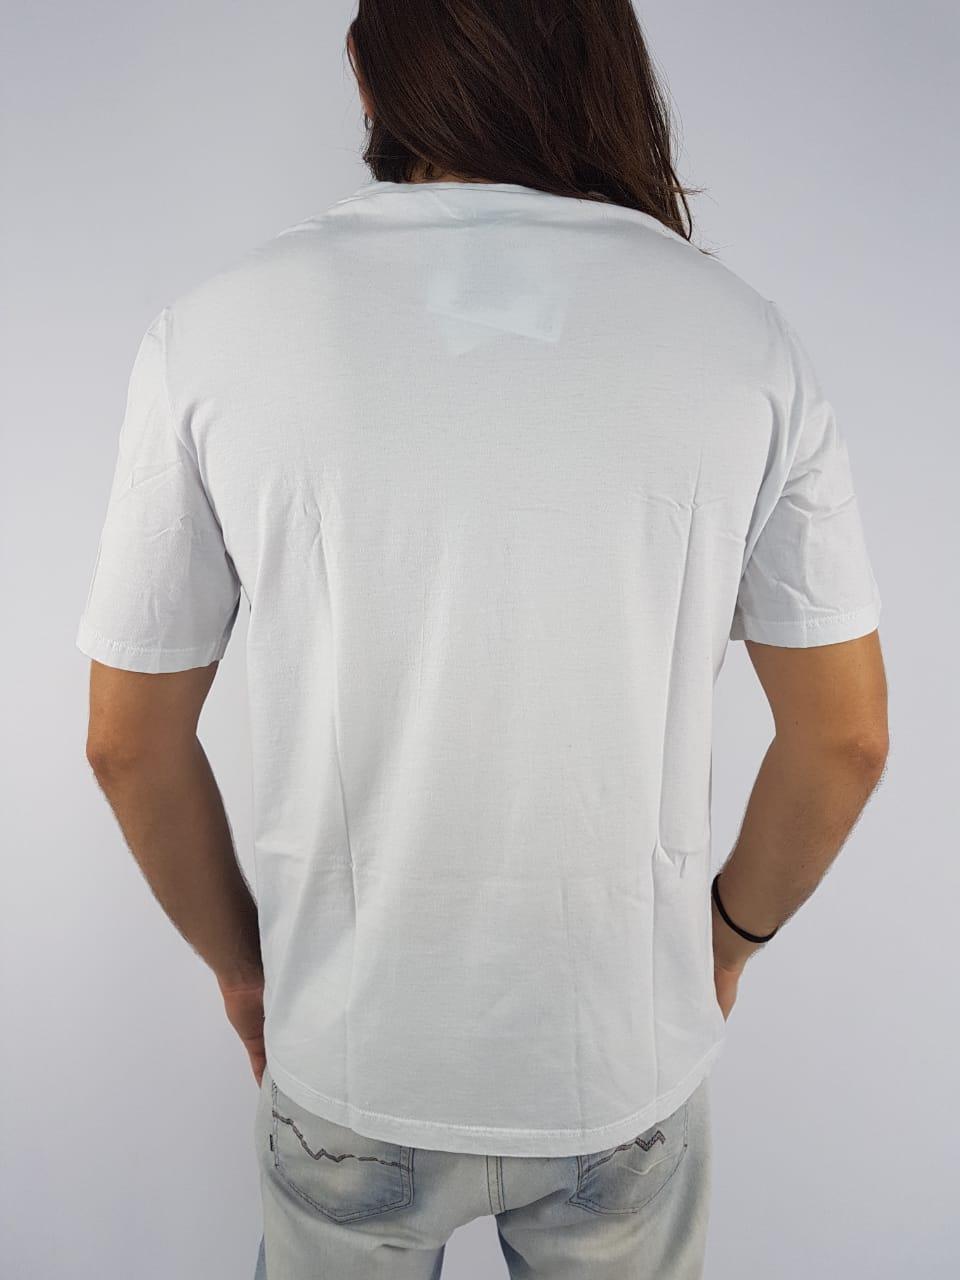 Camiseta Cavalera Masculina Bob Marley Manga Curta  - Pick Tita